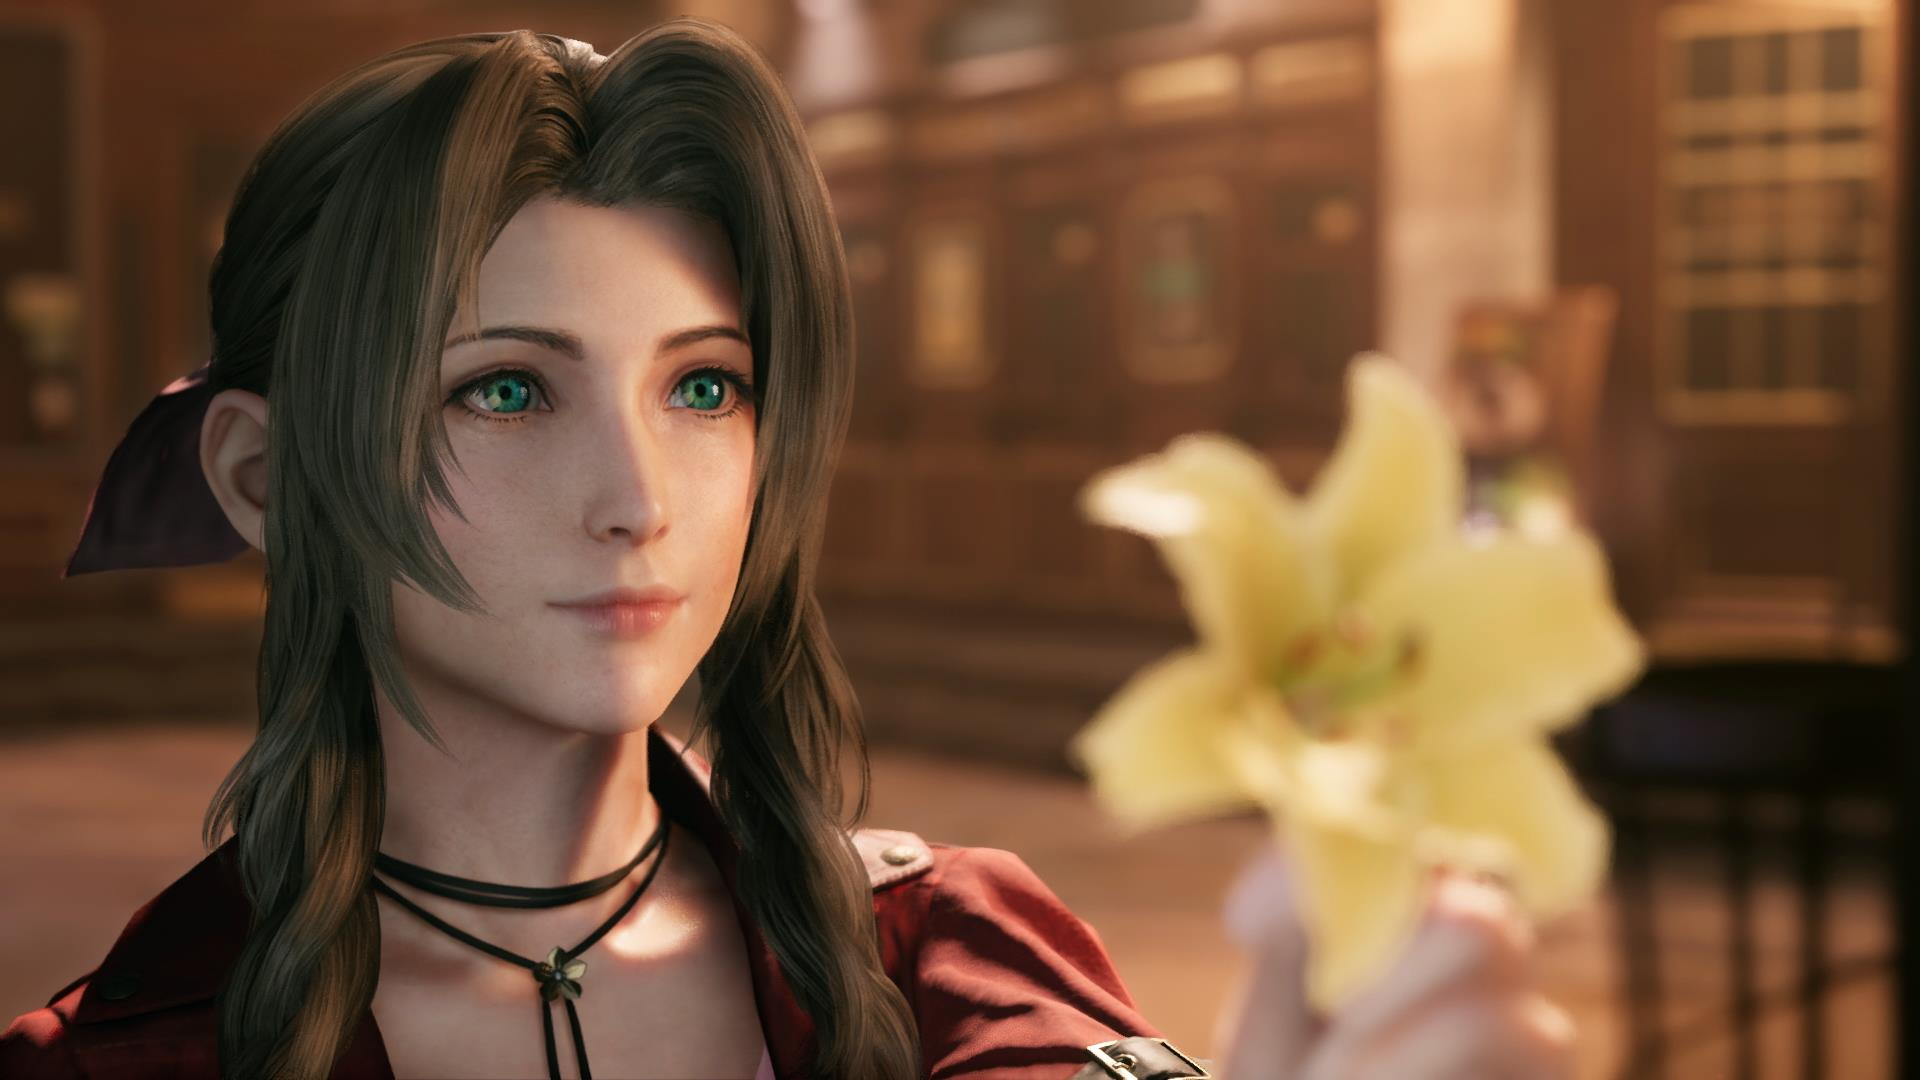 Final Fantasy 7 Remake where to preorder